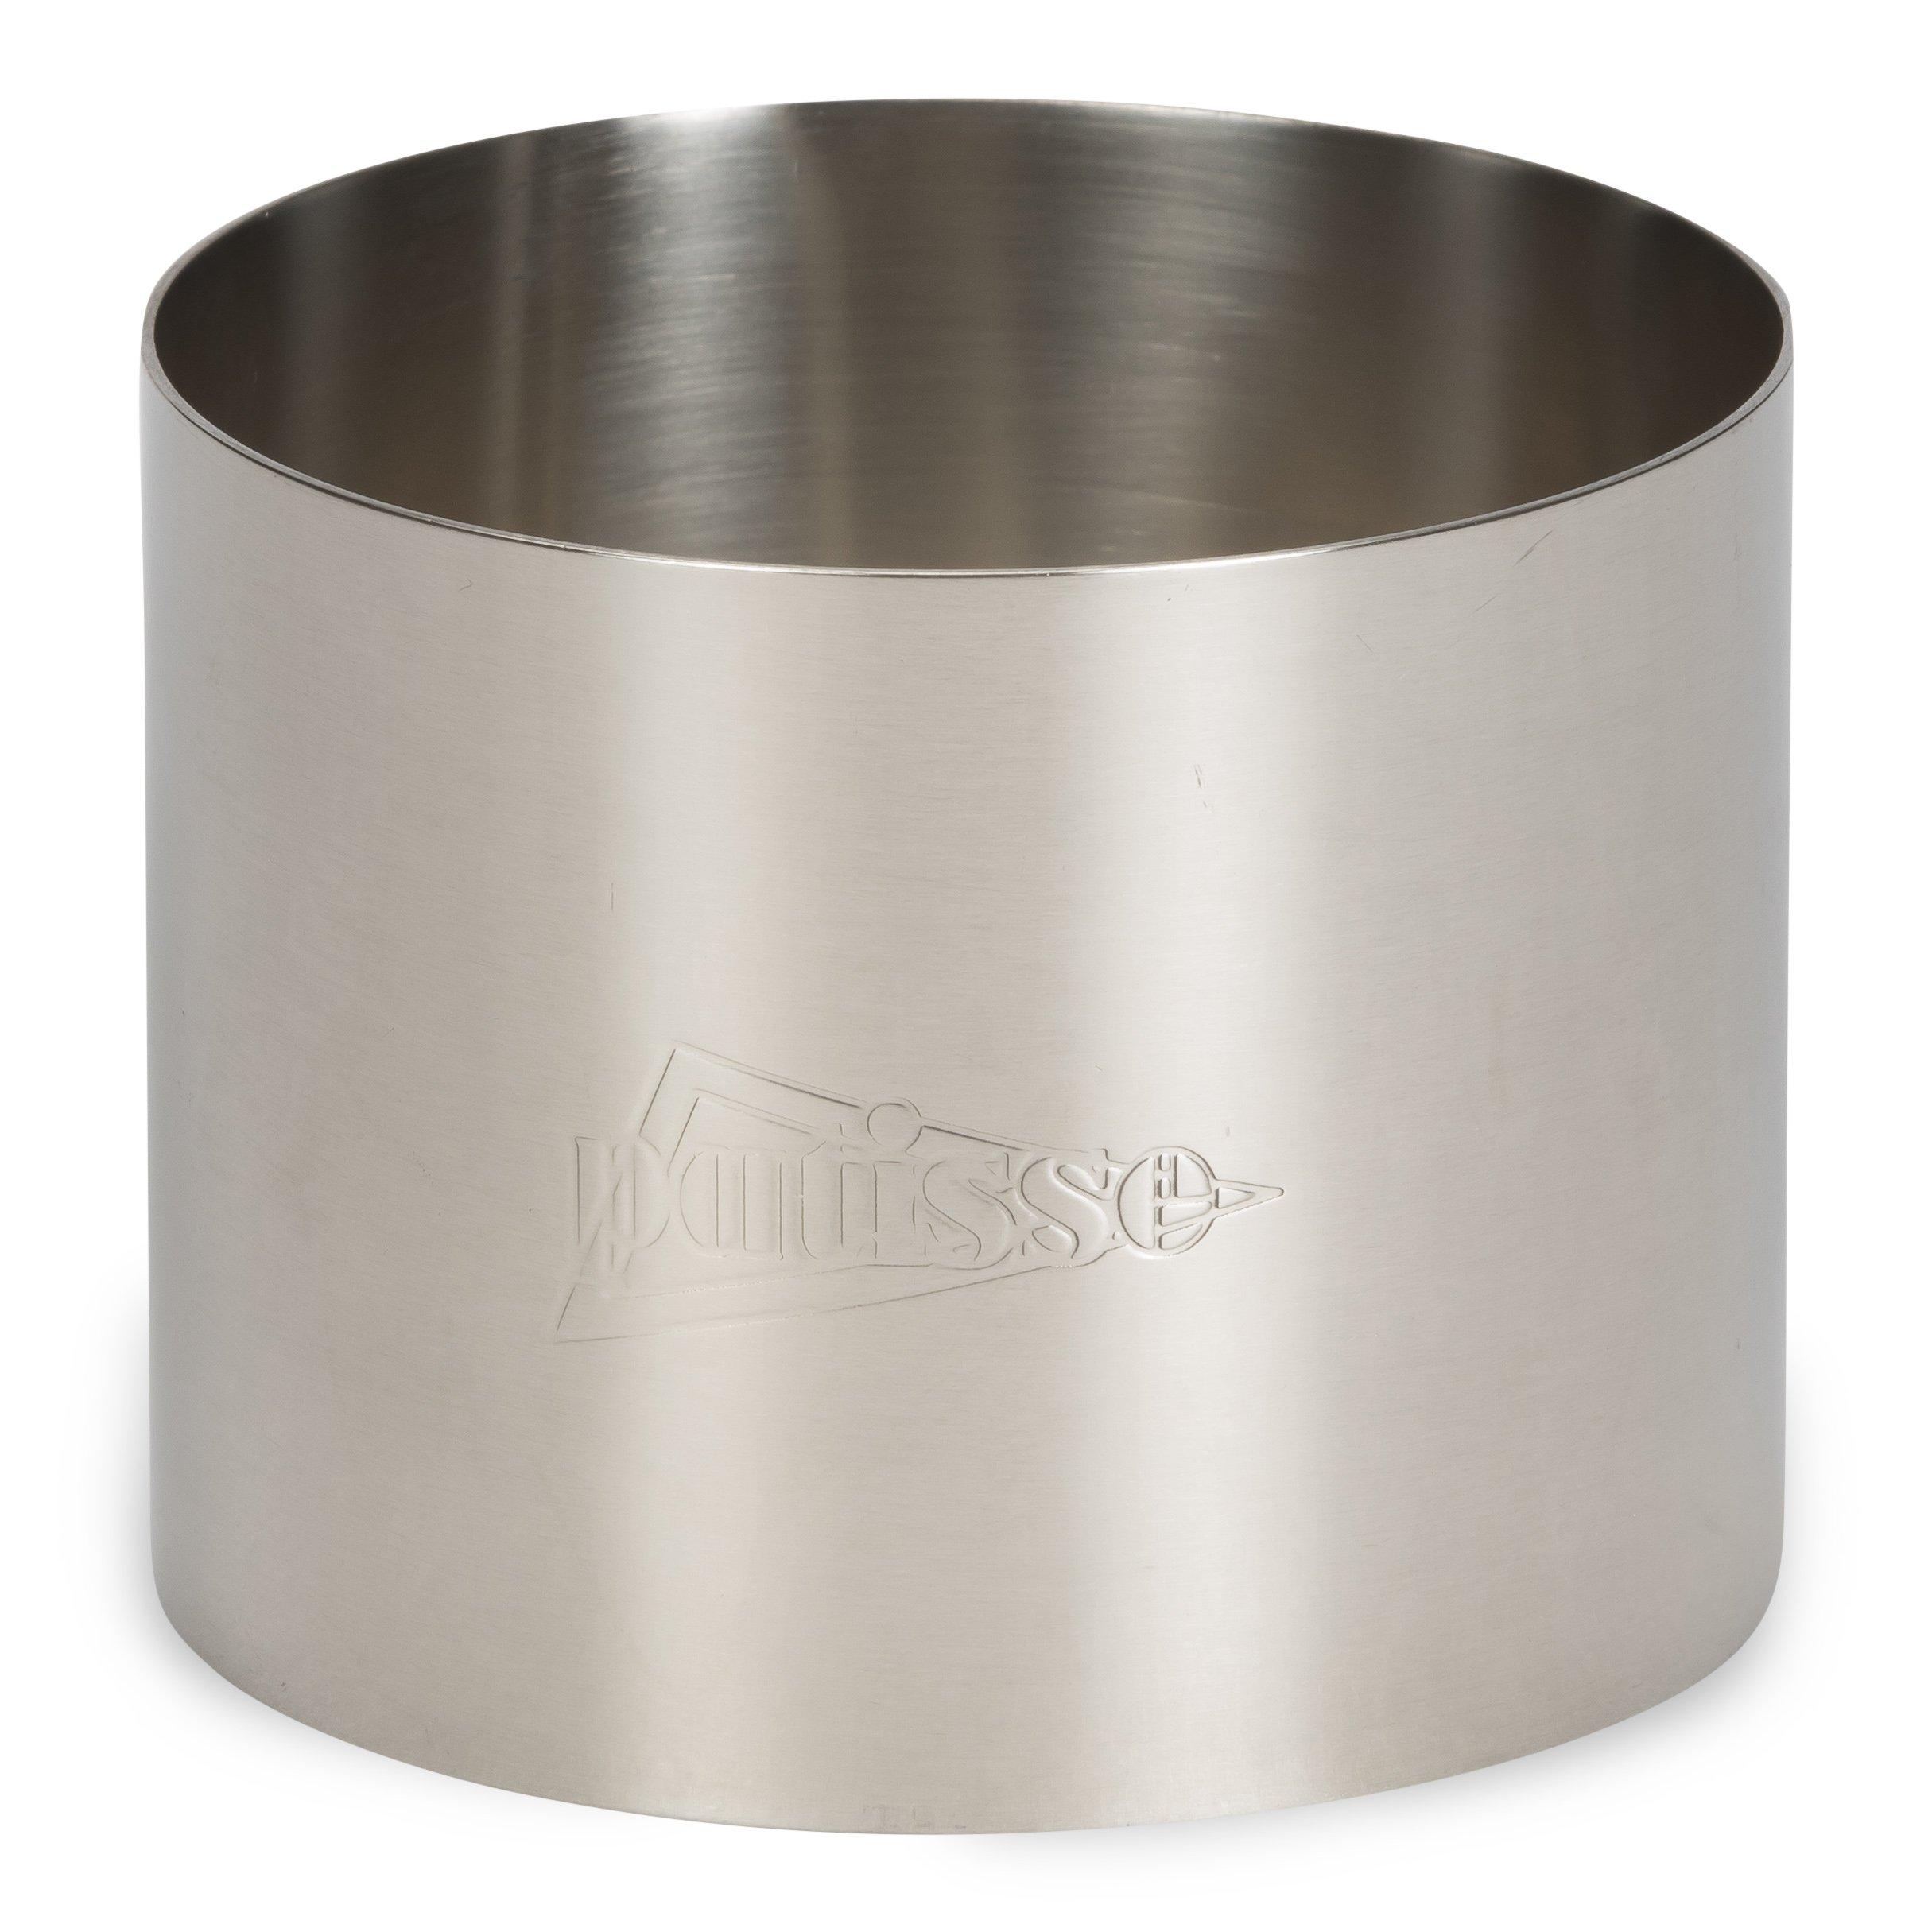 Patisse 02092 Round Cake Ring, 1-7/8-Inch